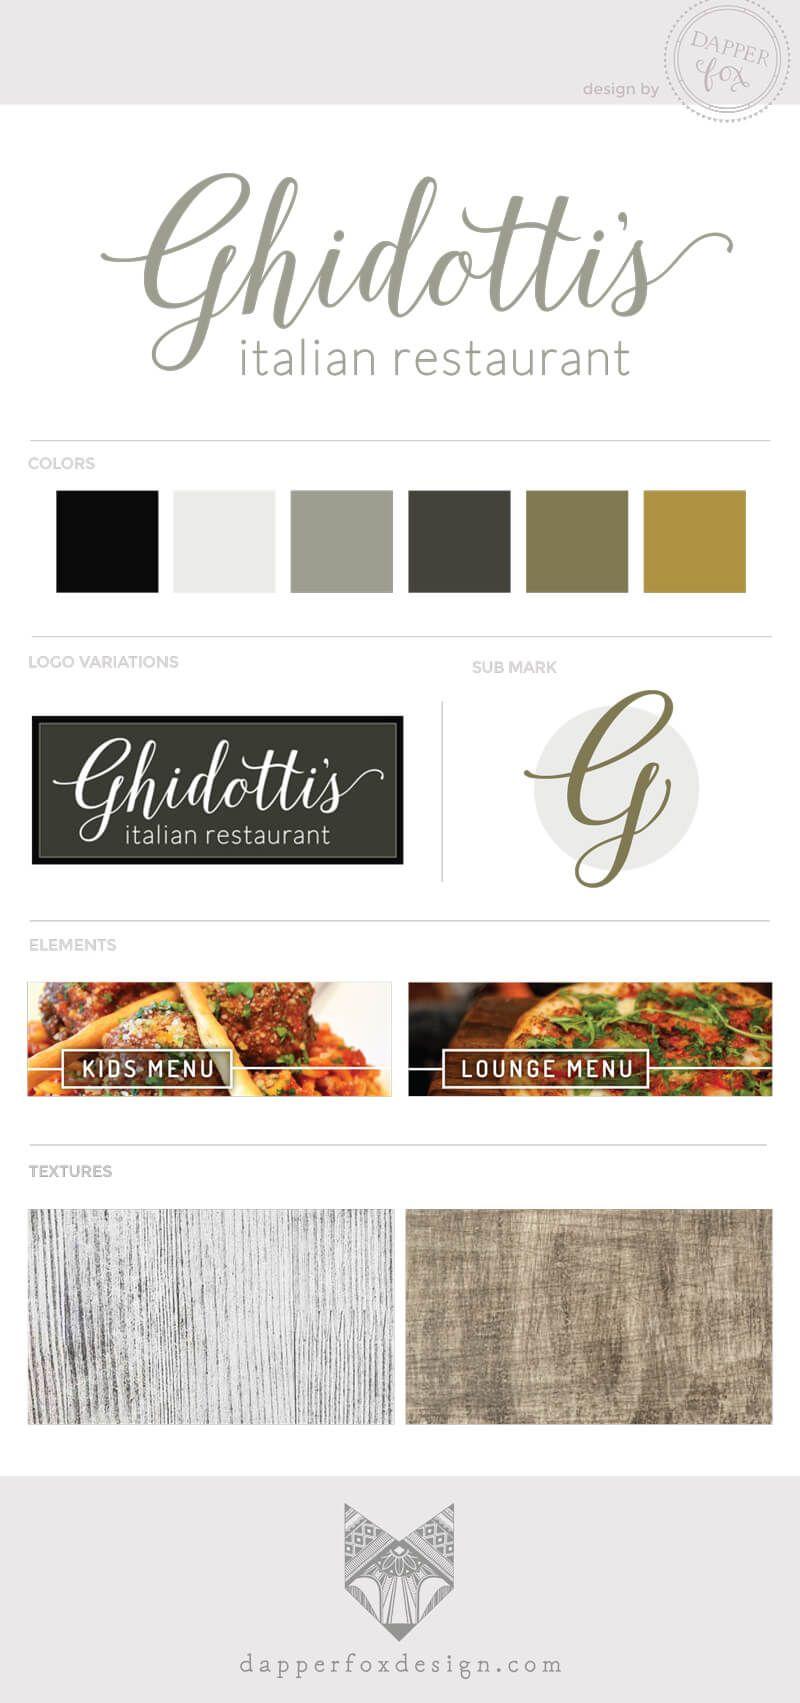 GhidottiS Italian Restaurant  Dapper Fox Design  Custom Menu